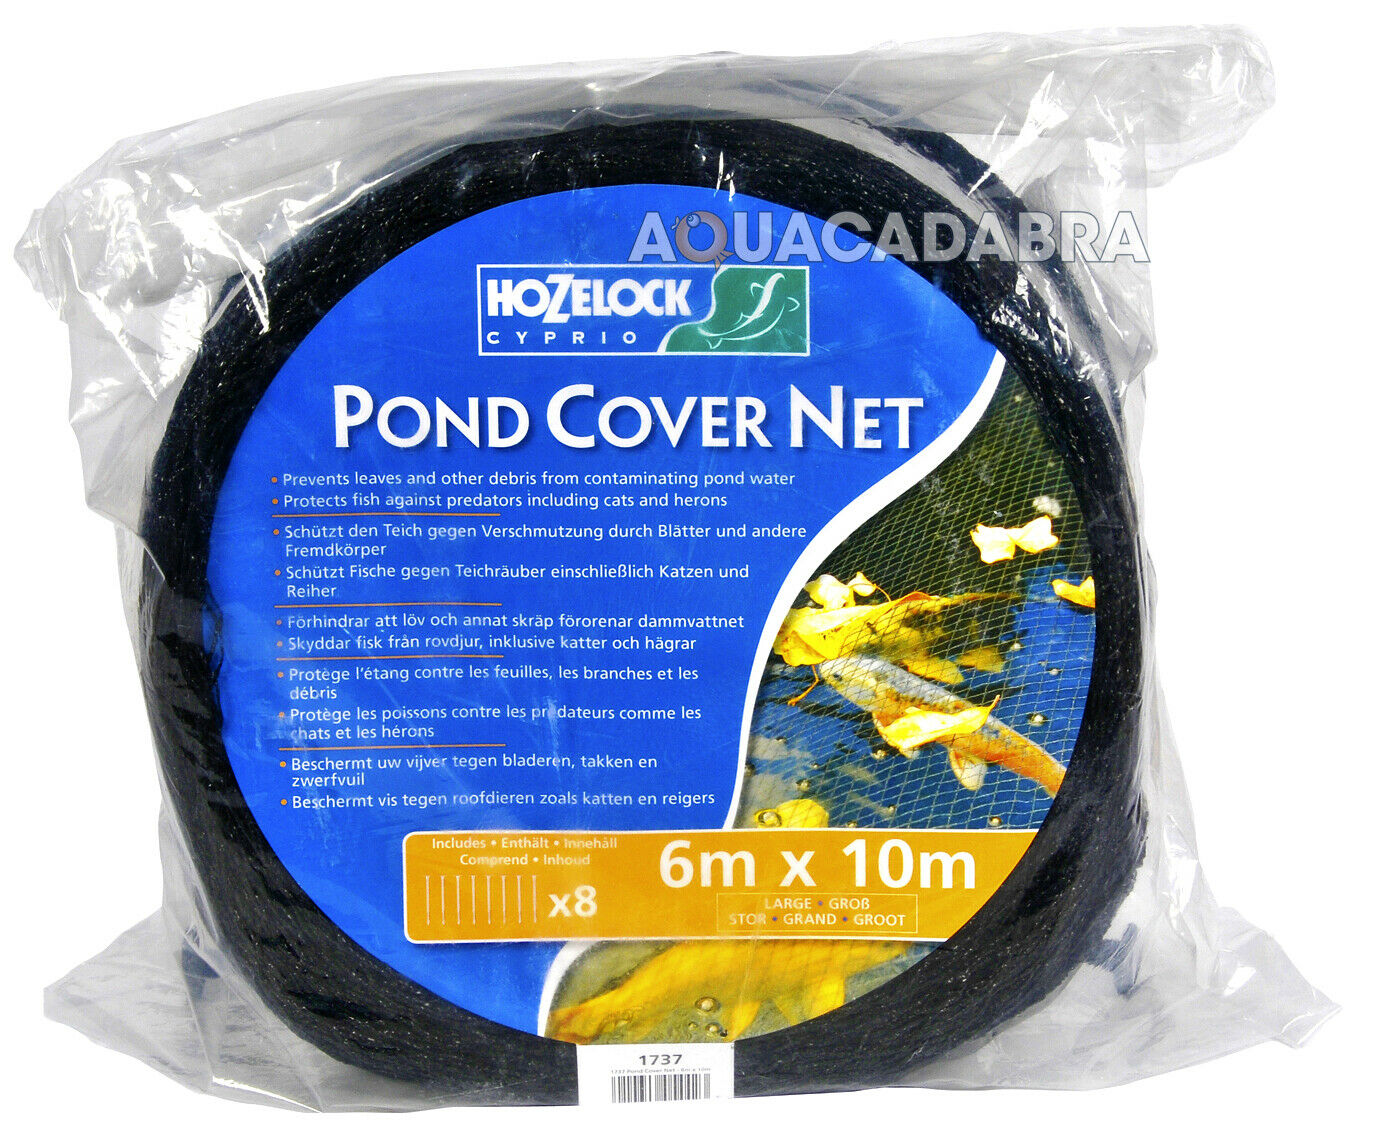 HOZELOCK 1730 pond couverture net 3m x 2m Bassin Koi Fish